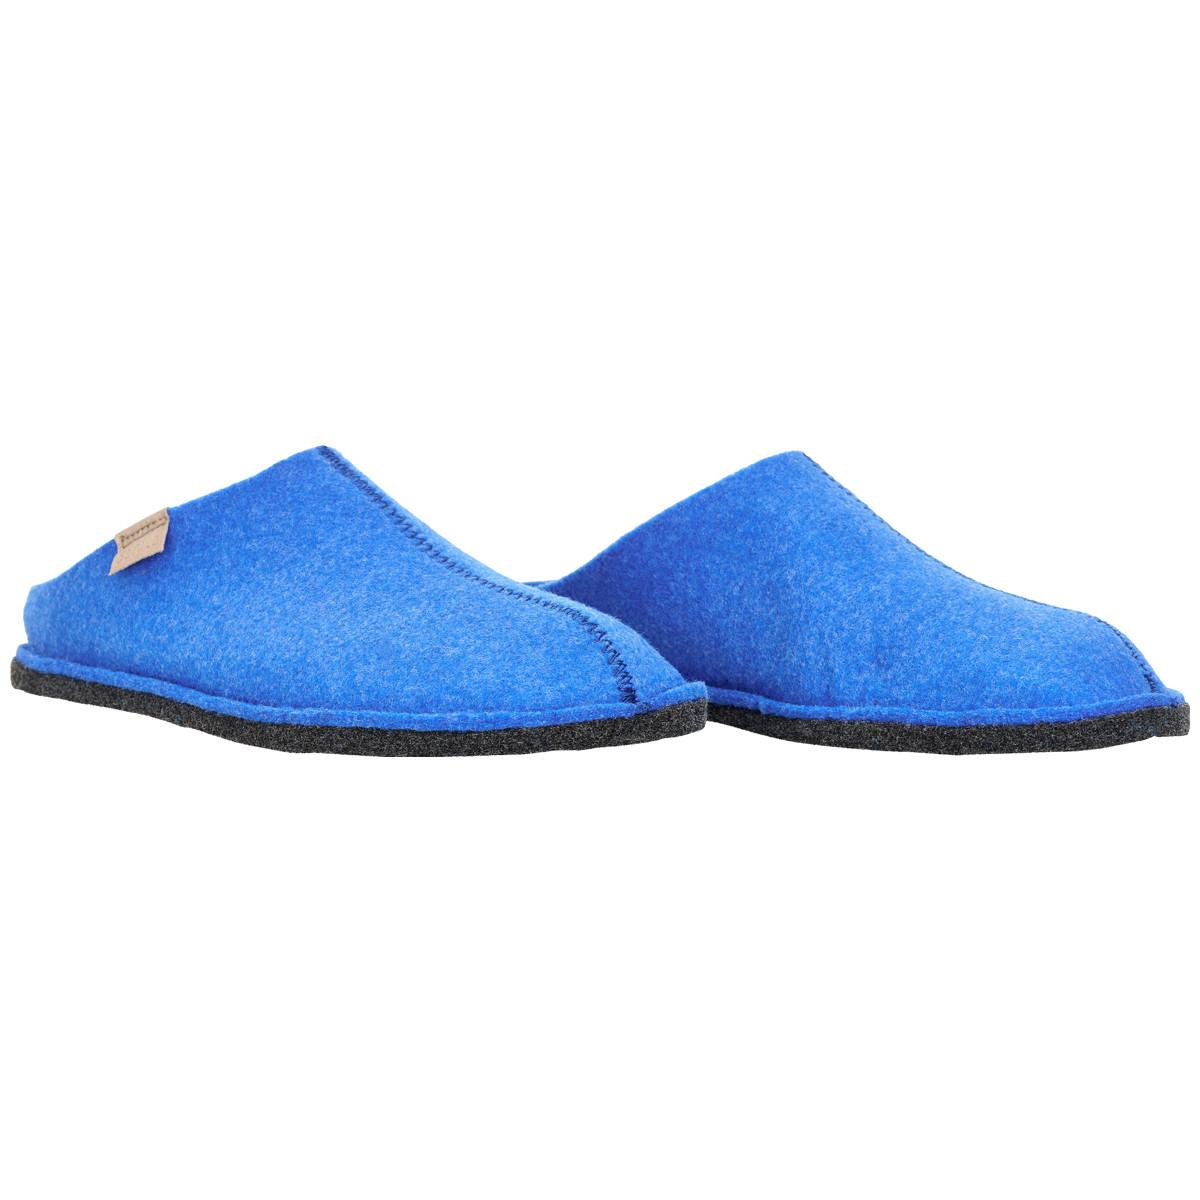 Sanita Hogga Slippers 460002 5